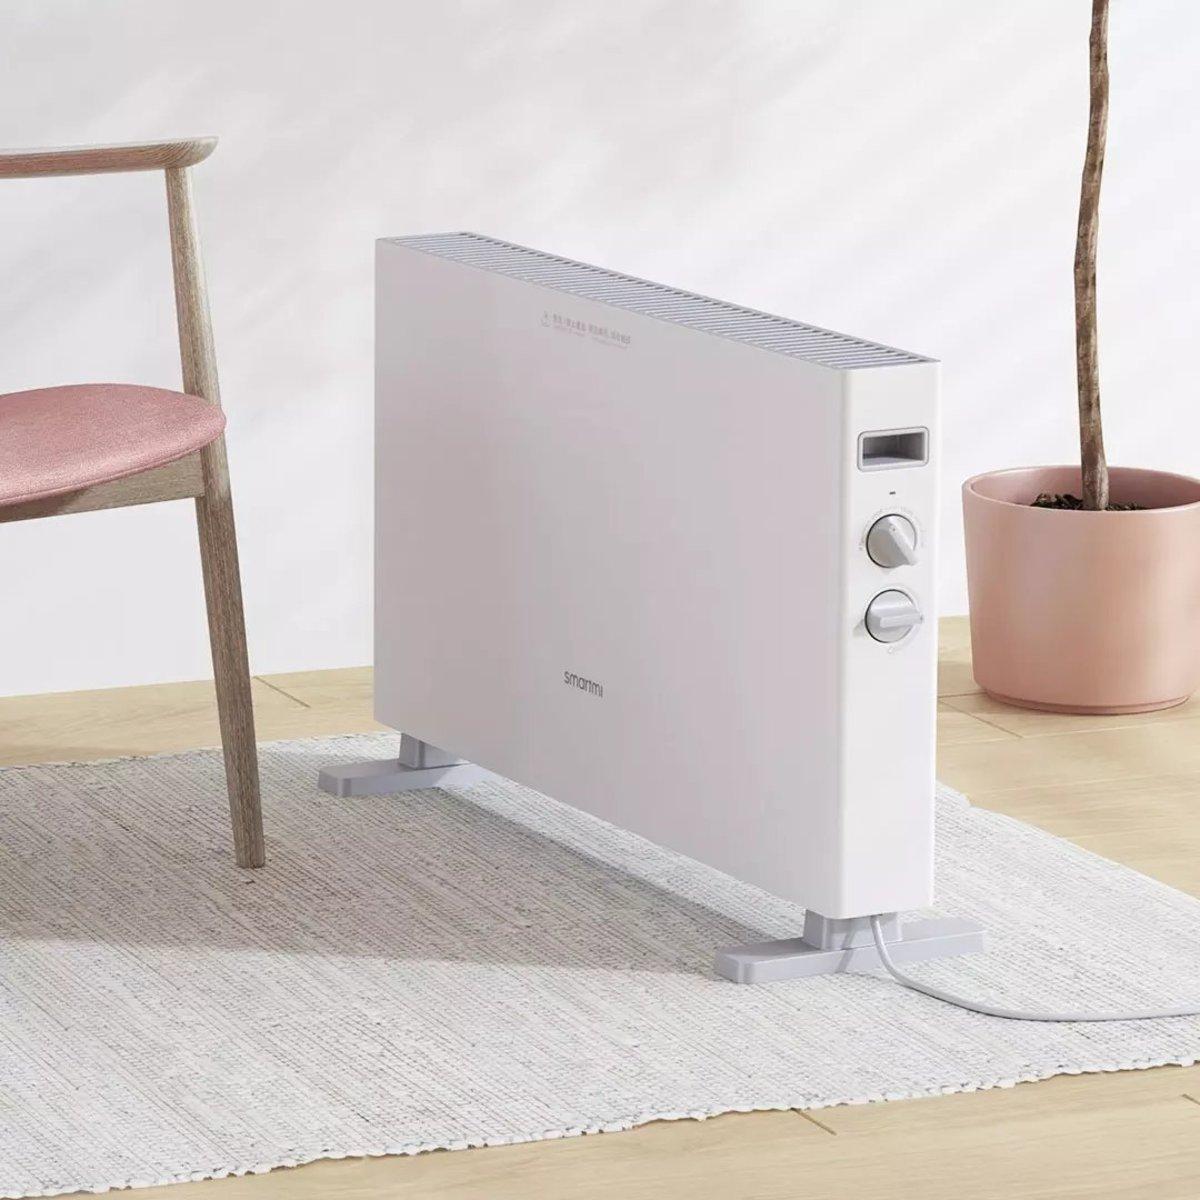 Electric Heater 1S DNQ04ZM (1 Year Warranty) - White